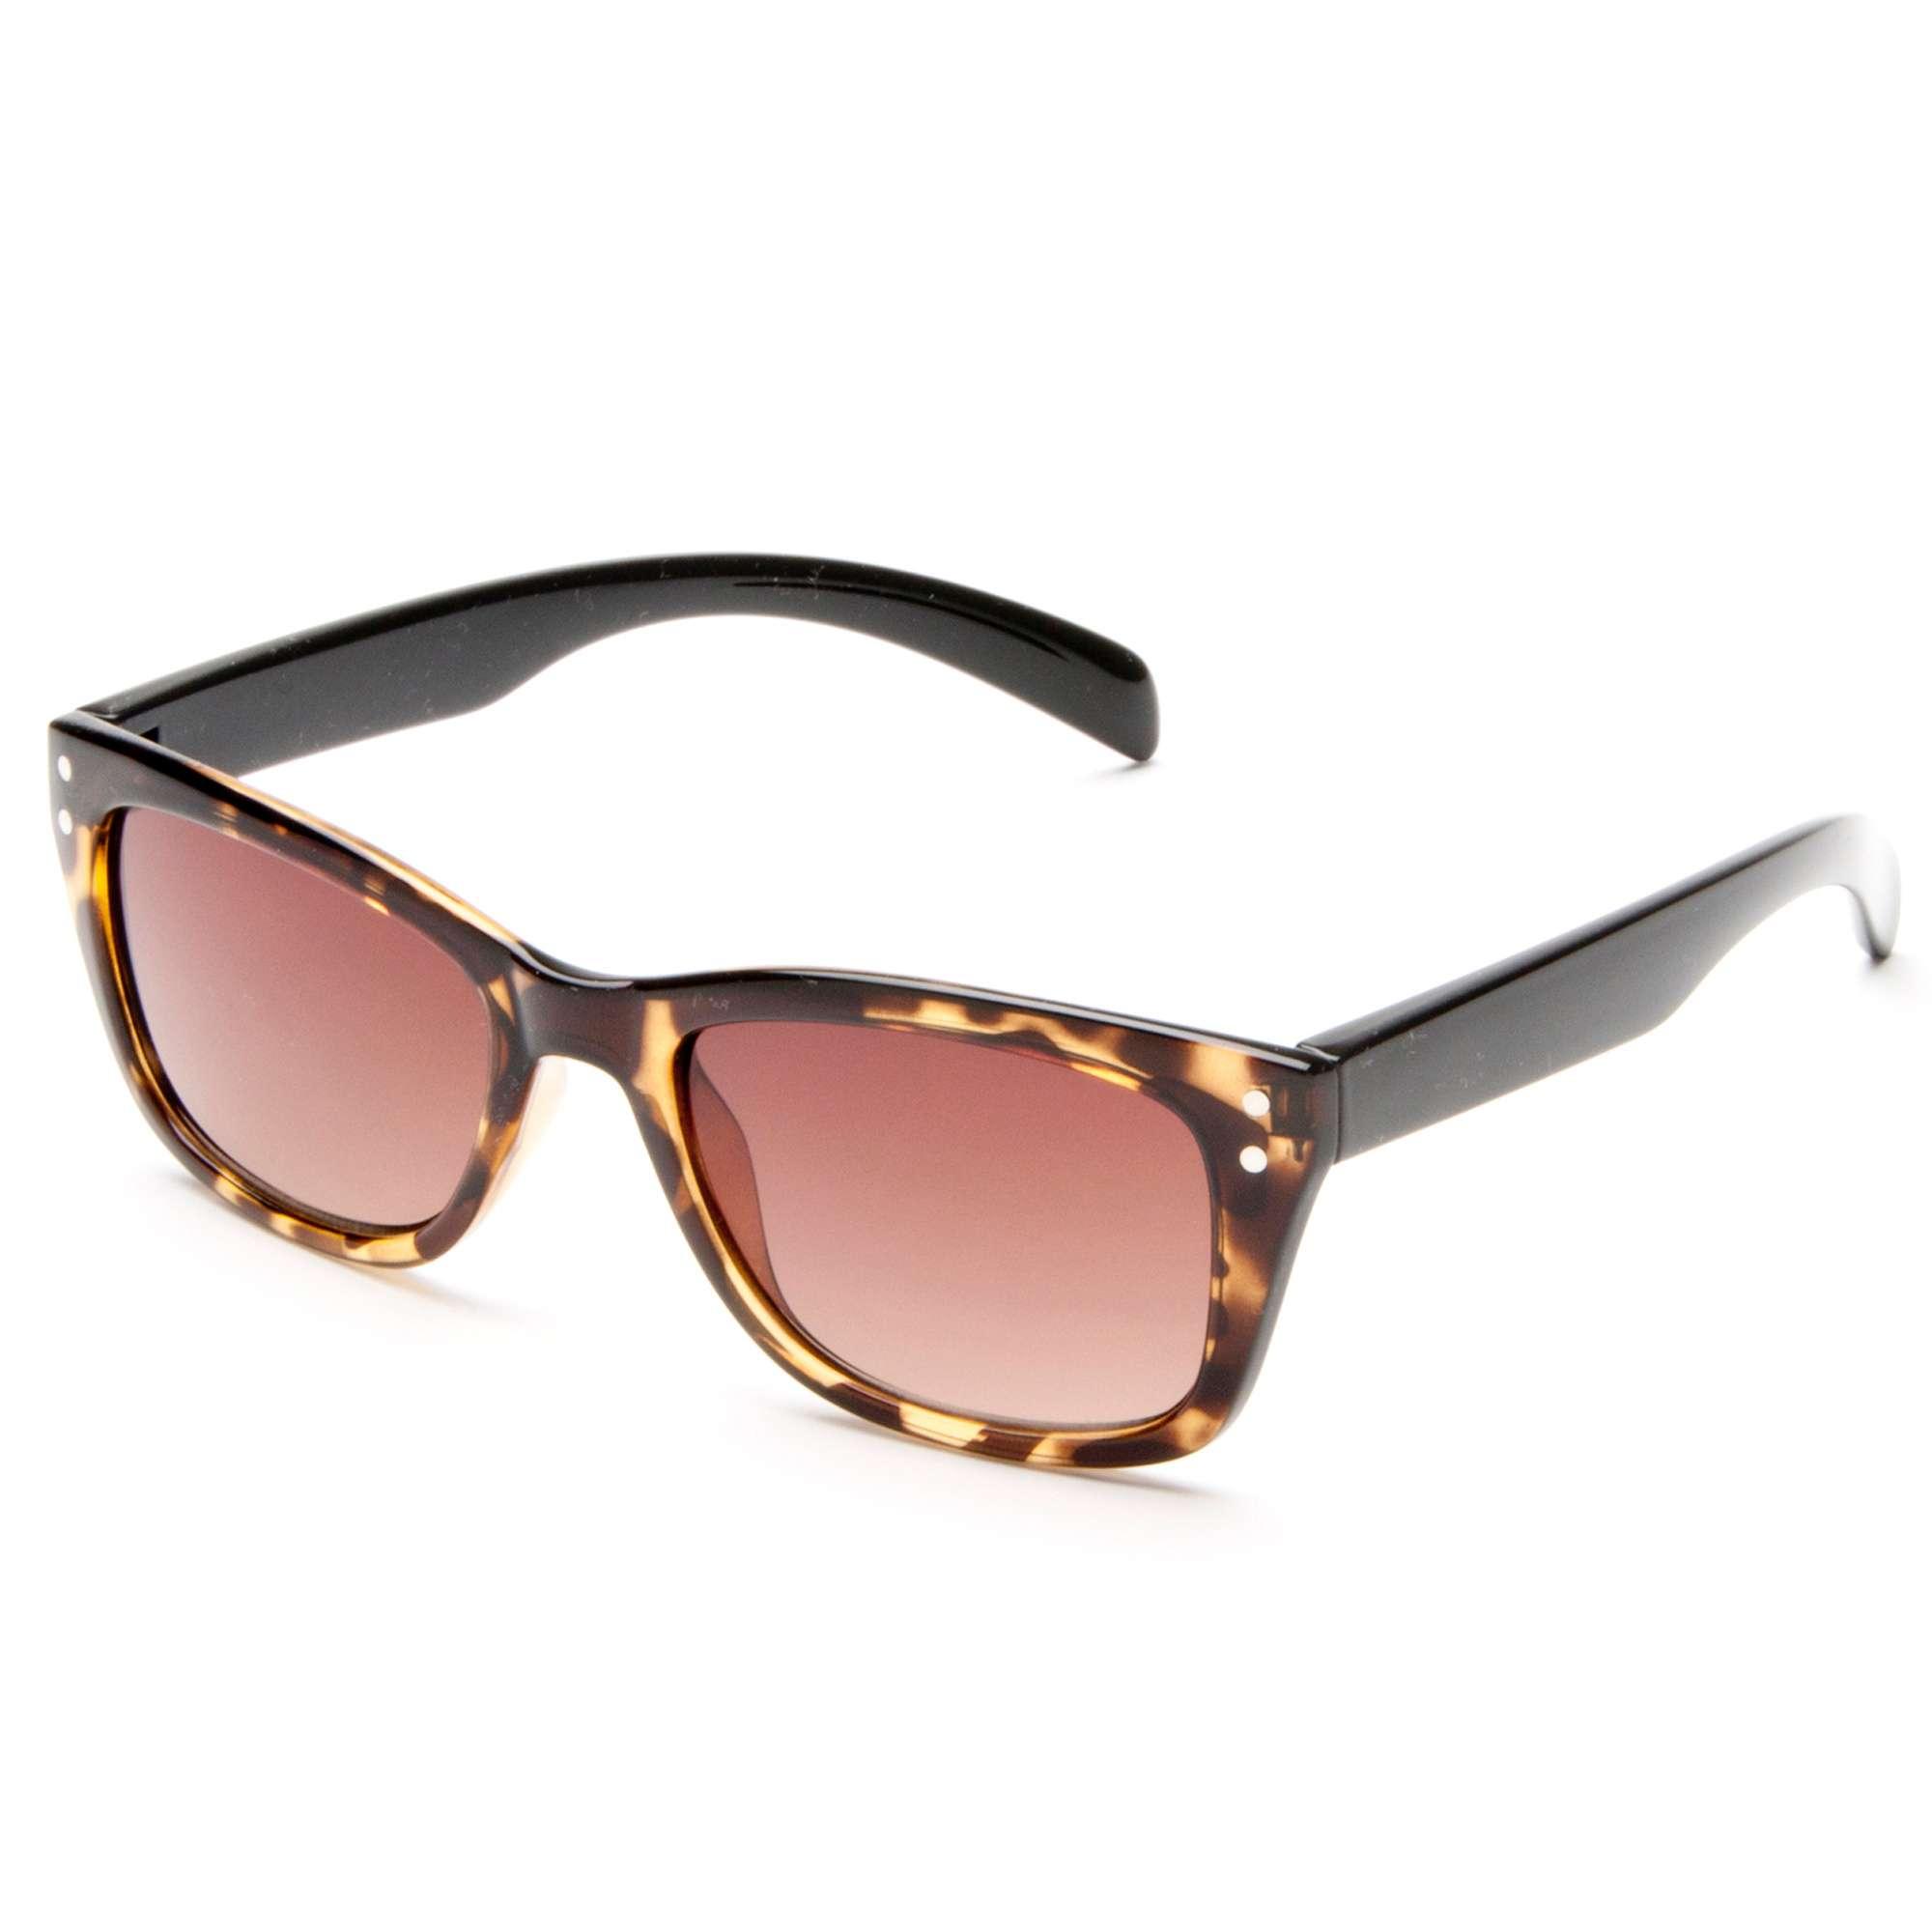 PETER STORM Boy's FF Retro Style Sunglasses